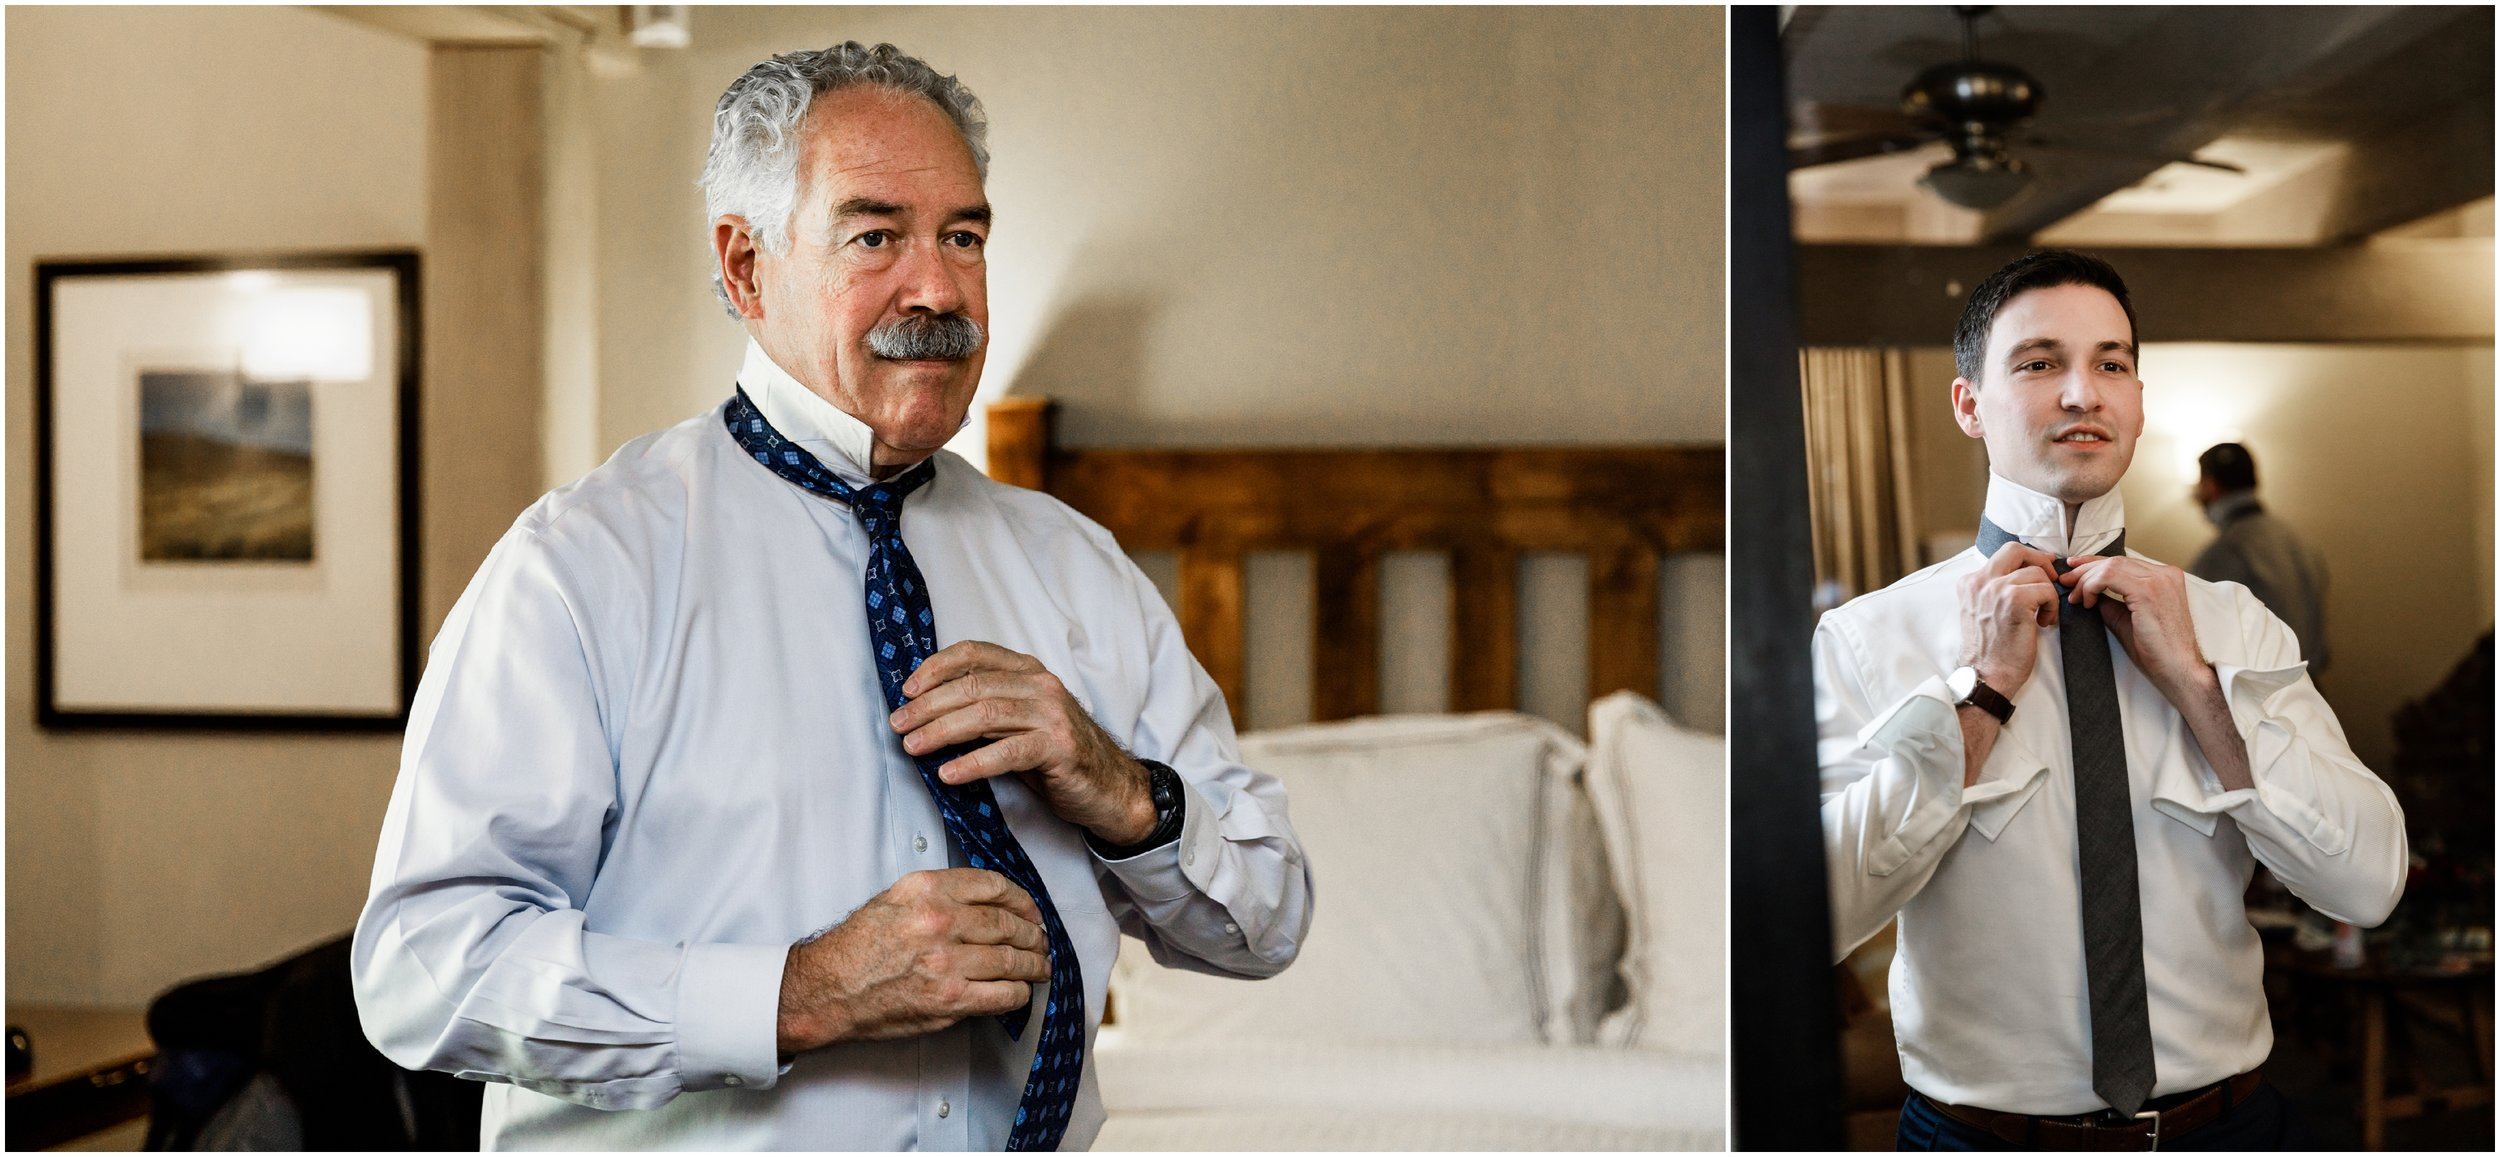 father of groom adjusting tie